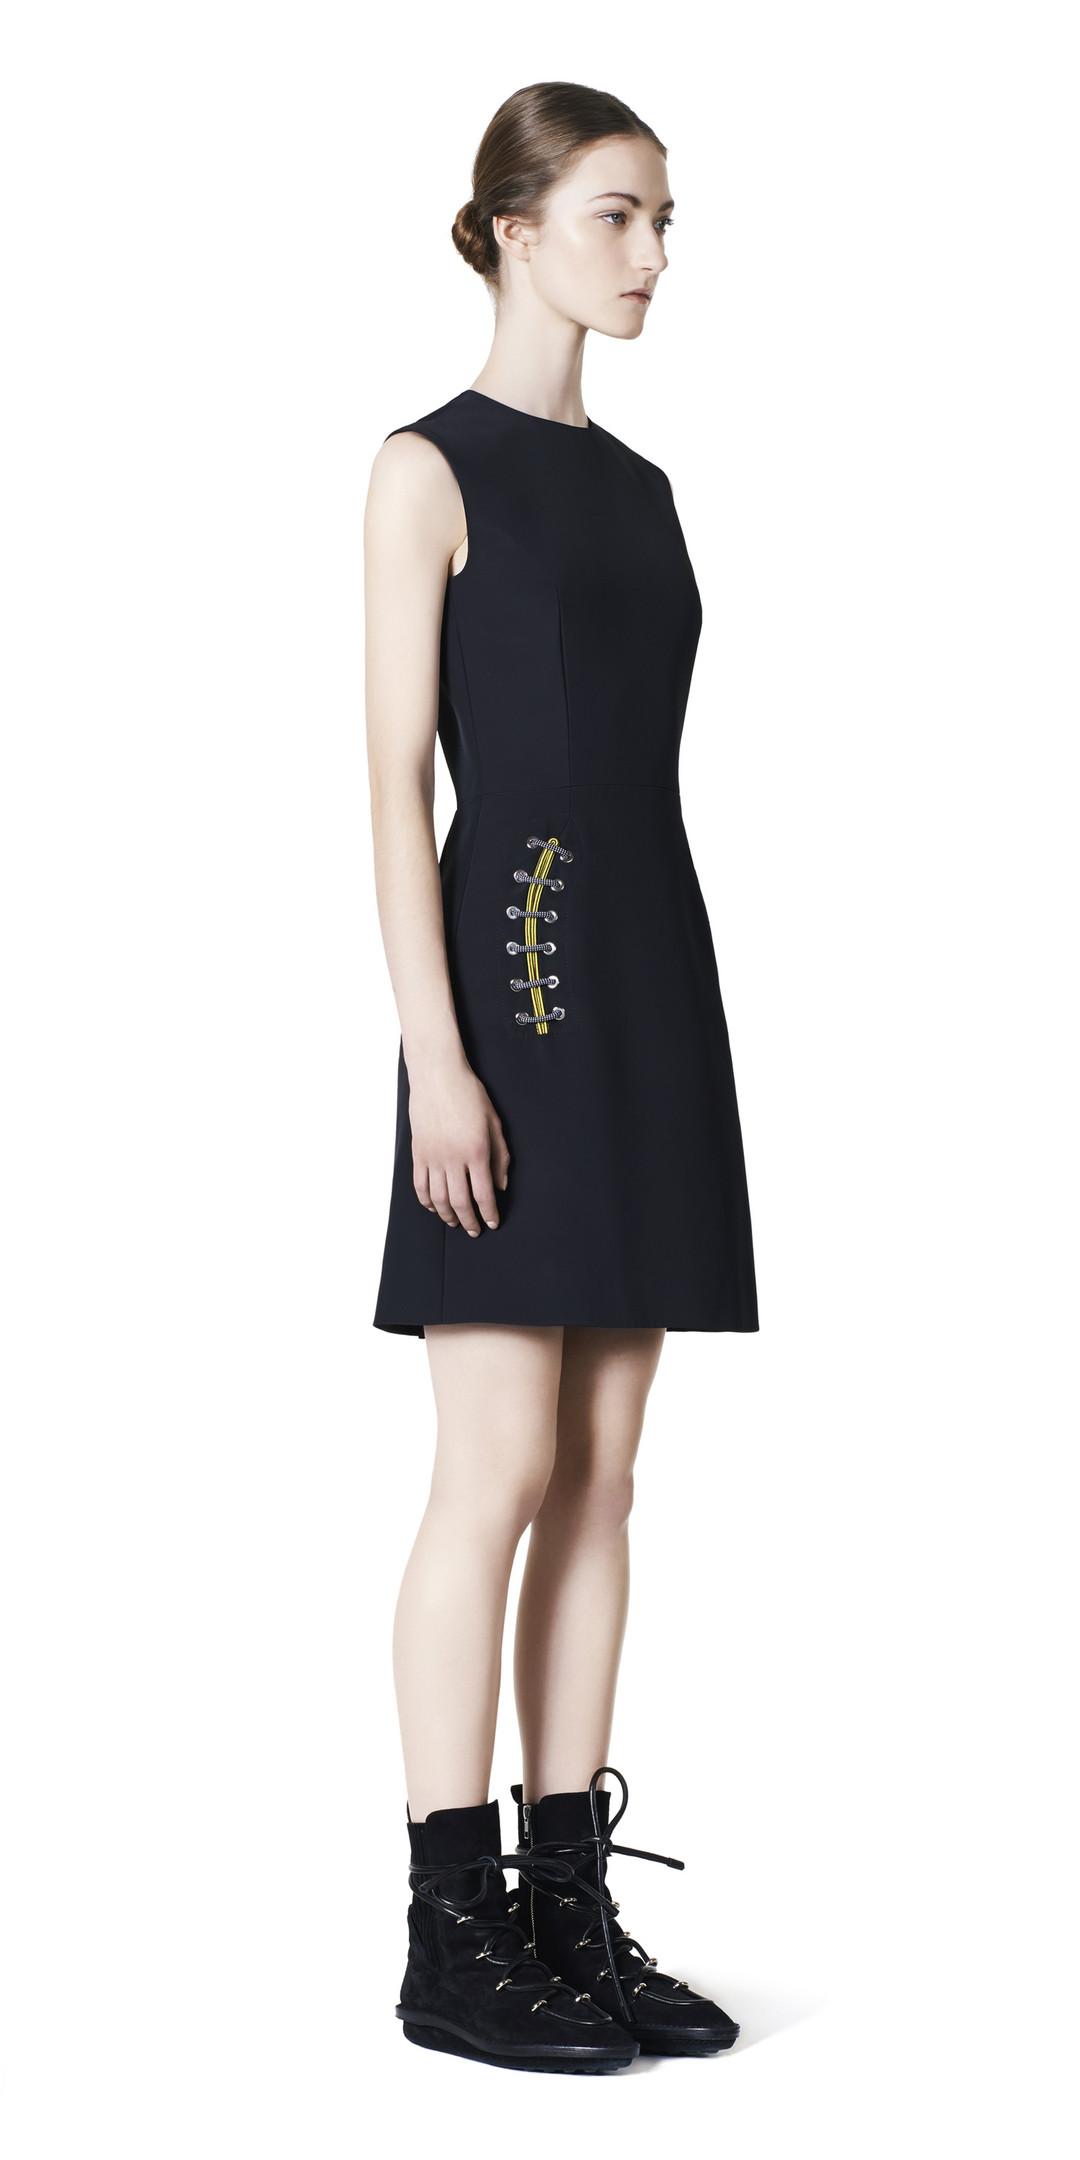 Balenciaga Shoe Lace Dress